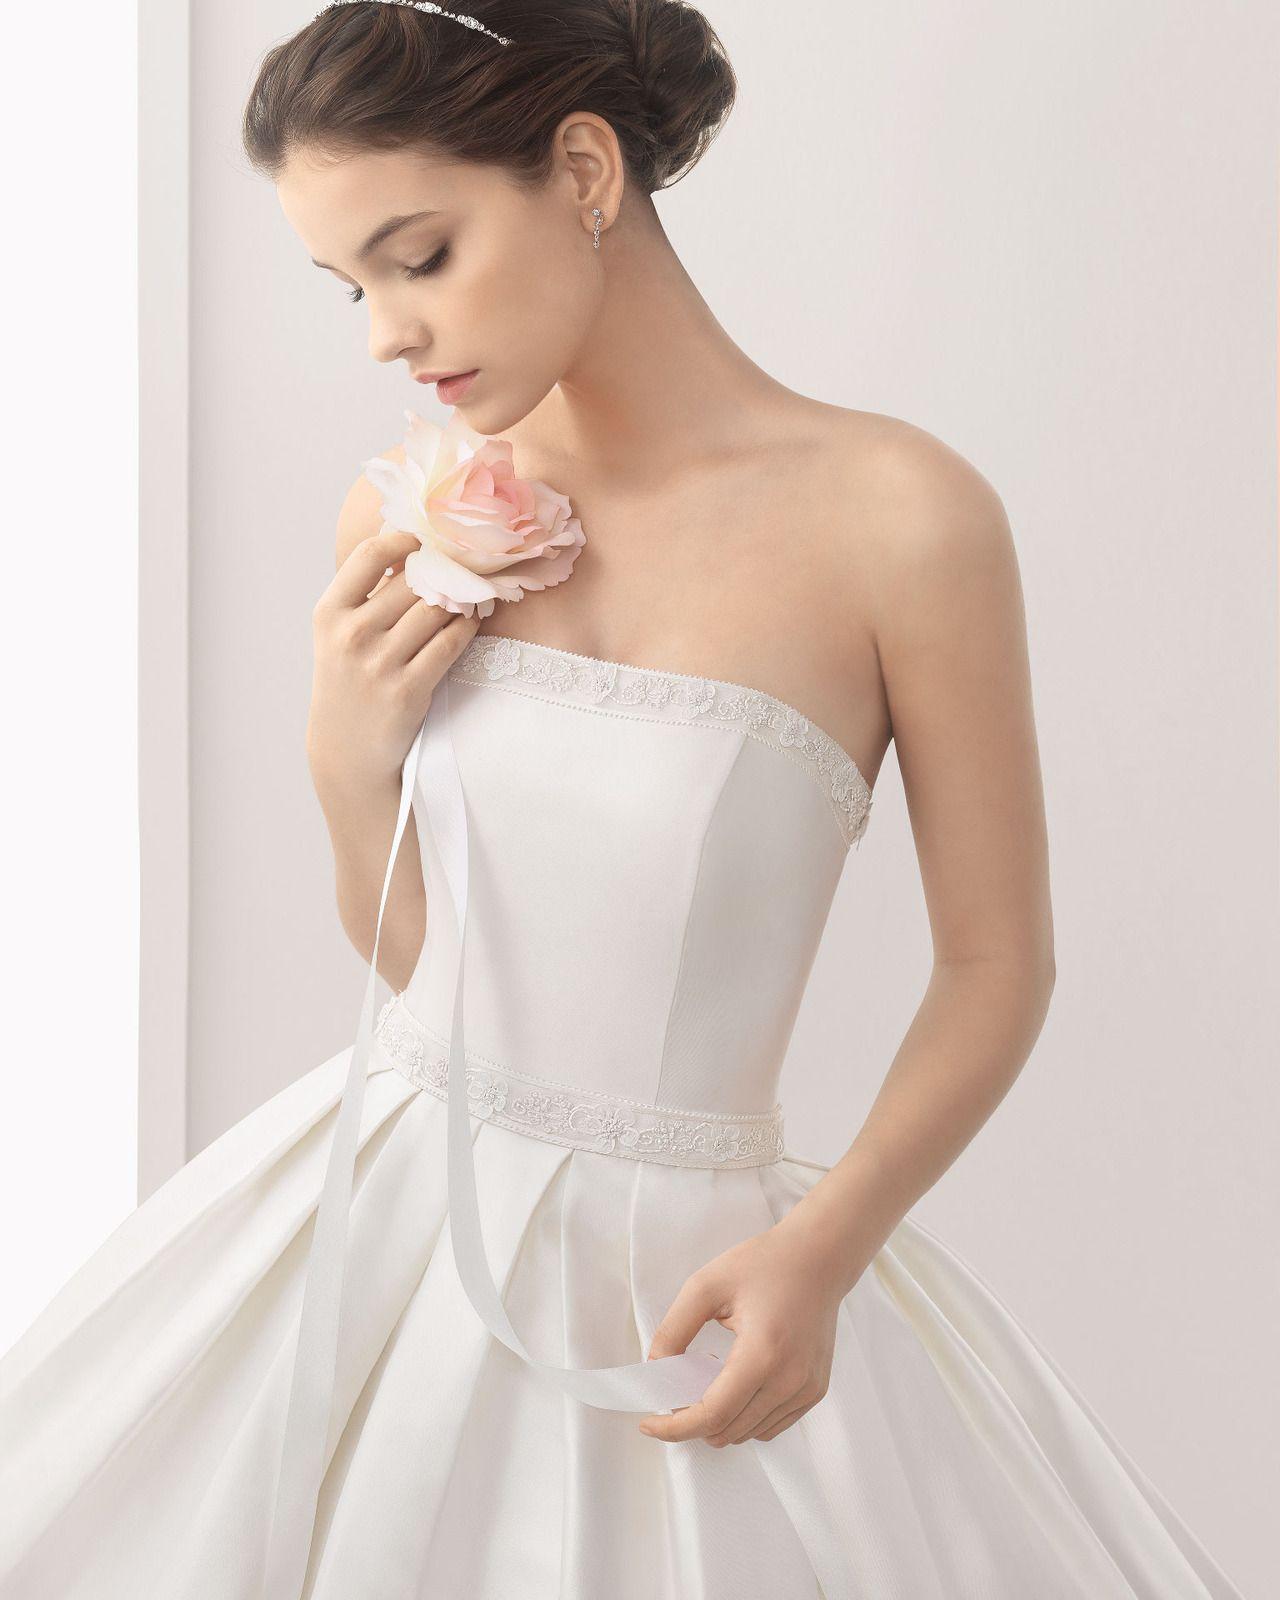 BARBARA PALVIN | вαявαяα ραℓvιи | Pinterest | Barbara palvin, Models ...